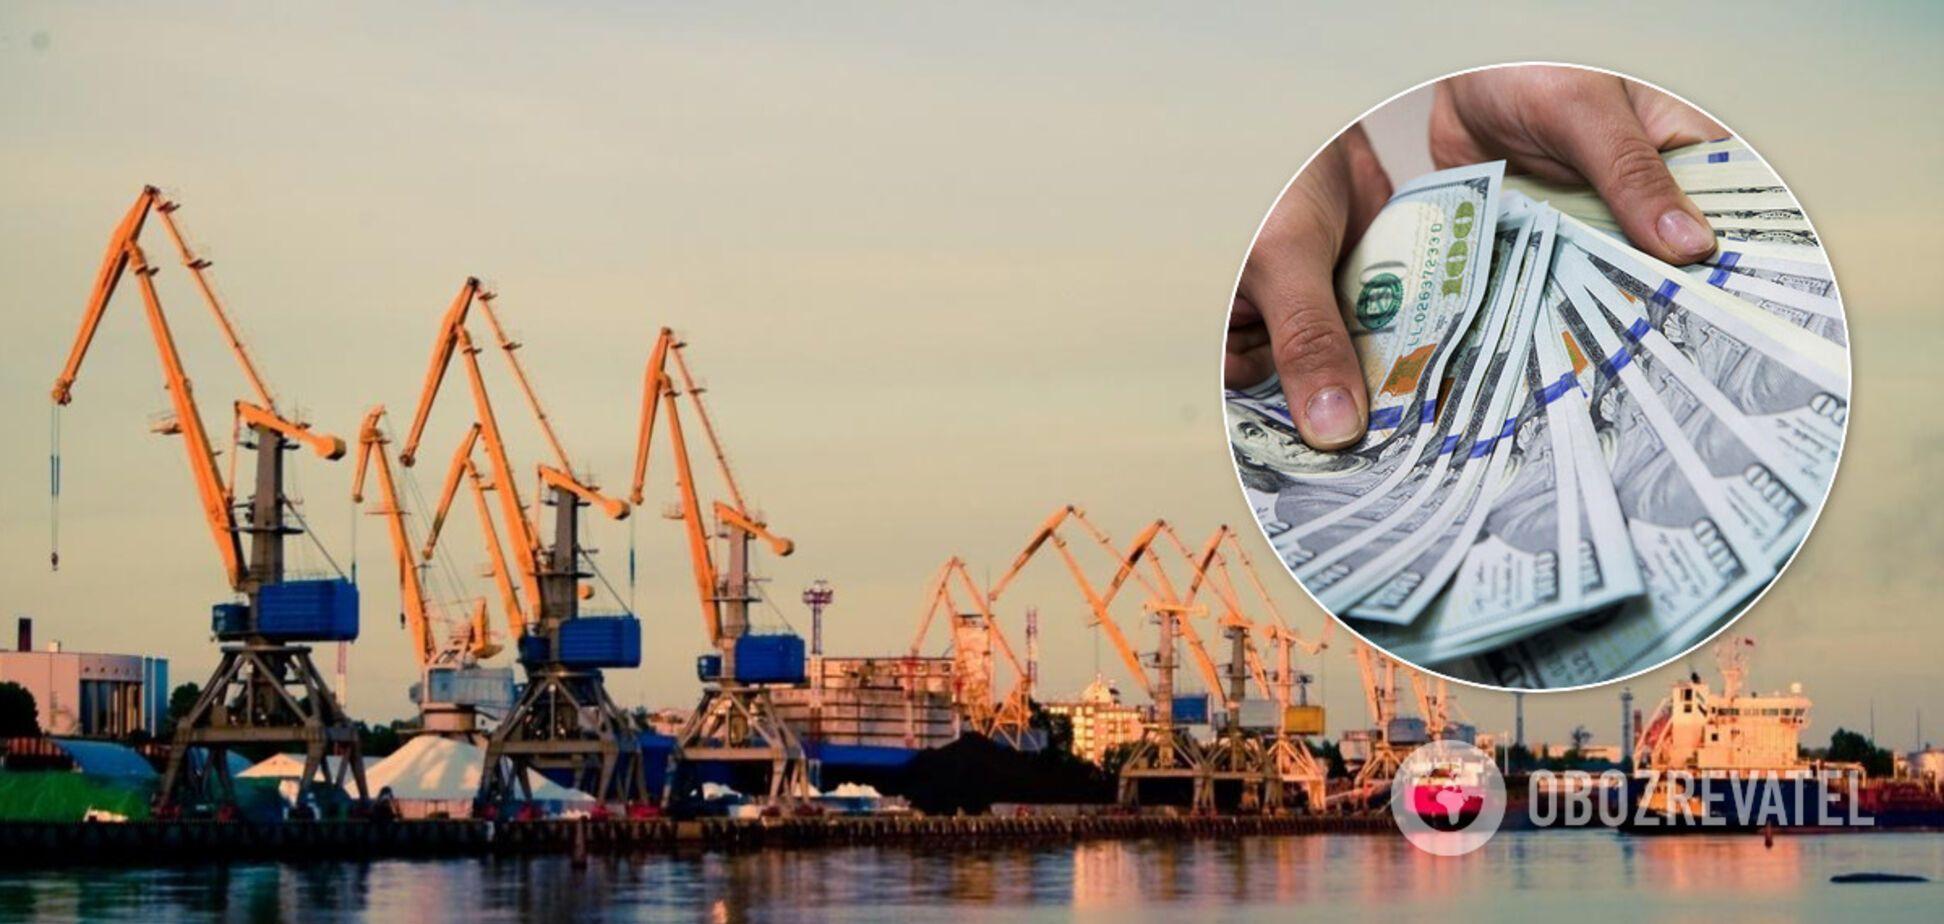 Украина привлекла 3,4 млрд гривен в морской порт 'Ольвия'